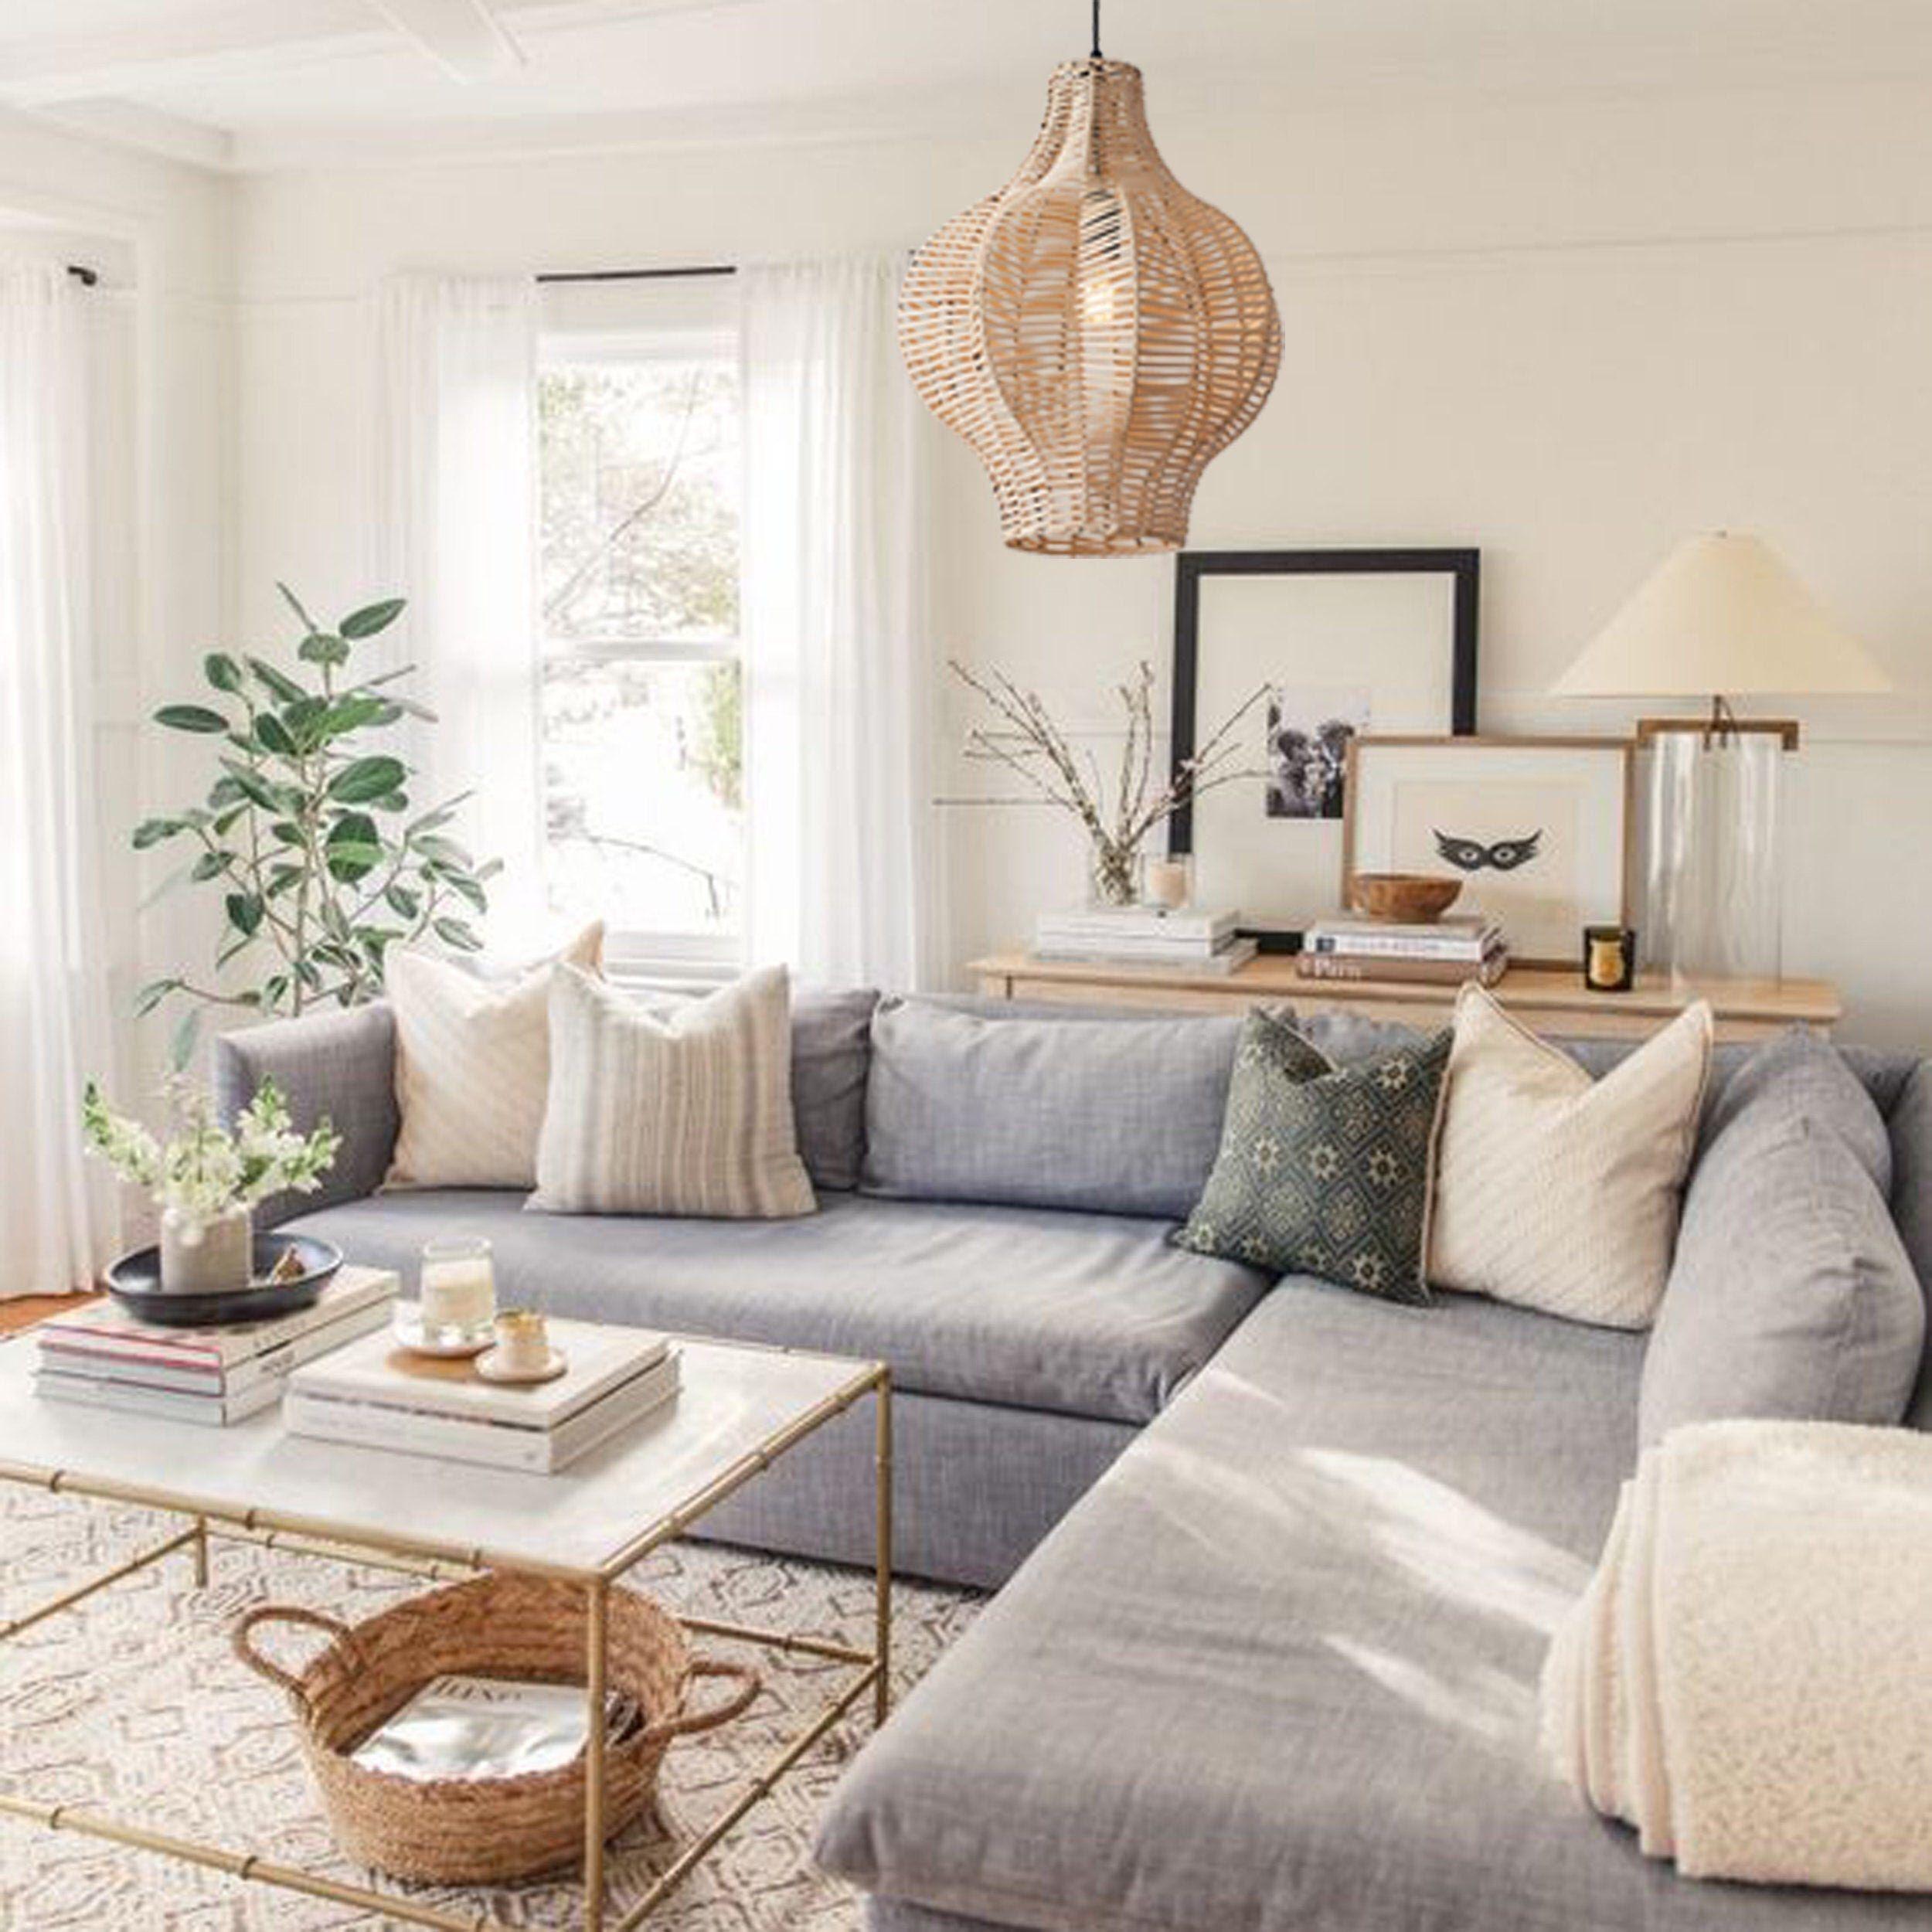 livingdecoration   Living room decor apartment, Living room colors ...